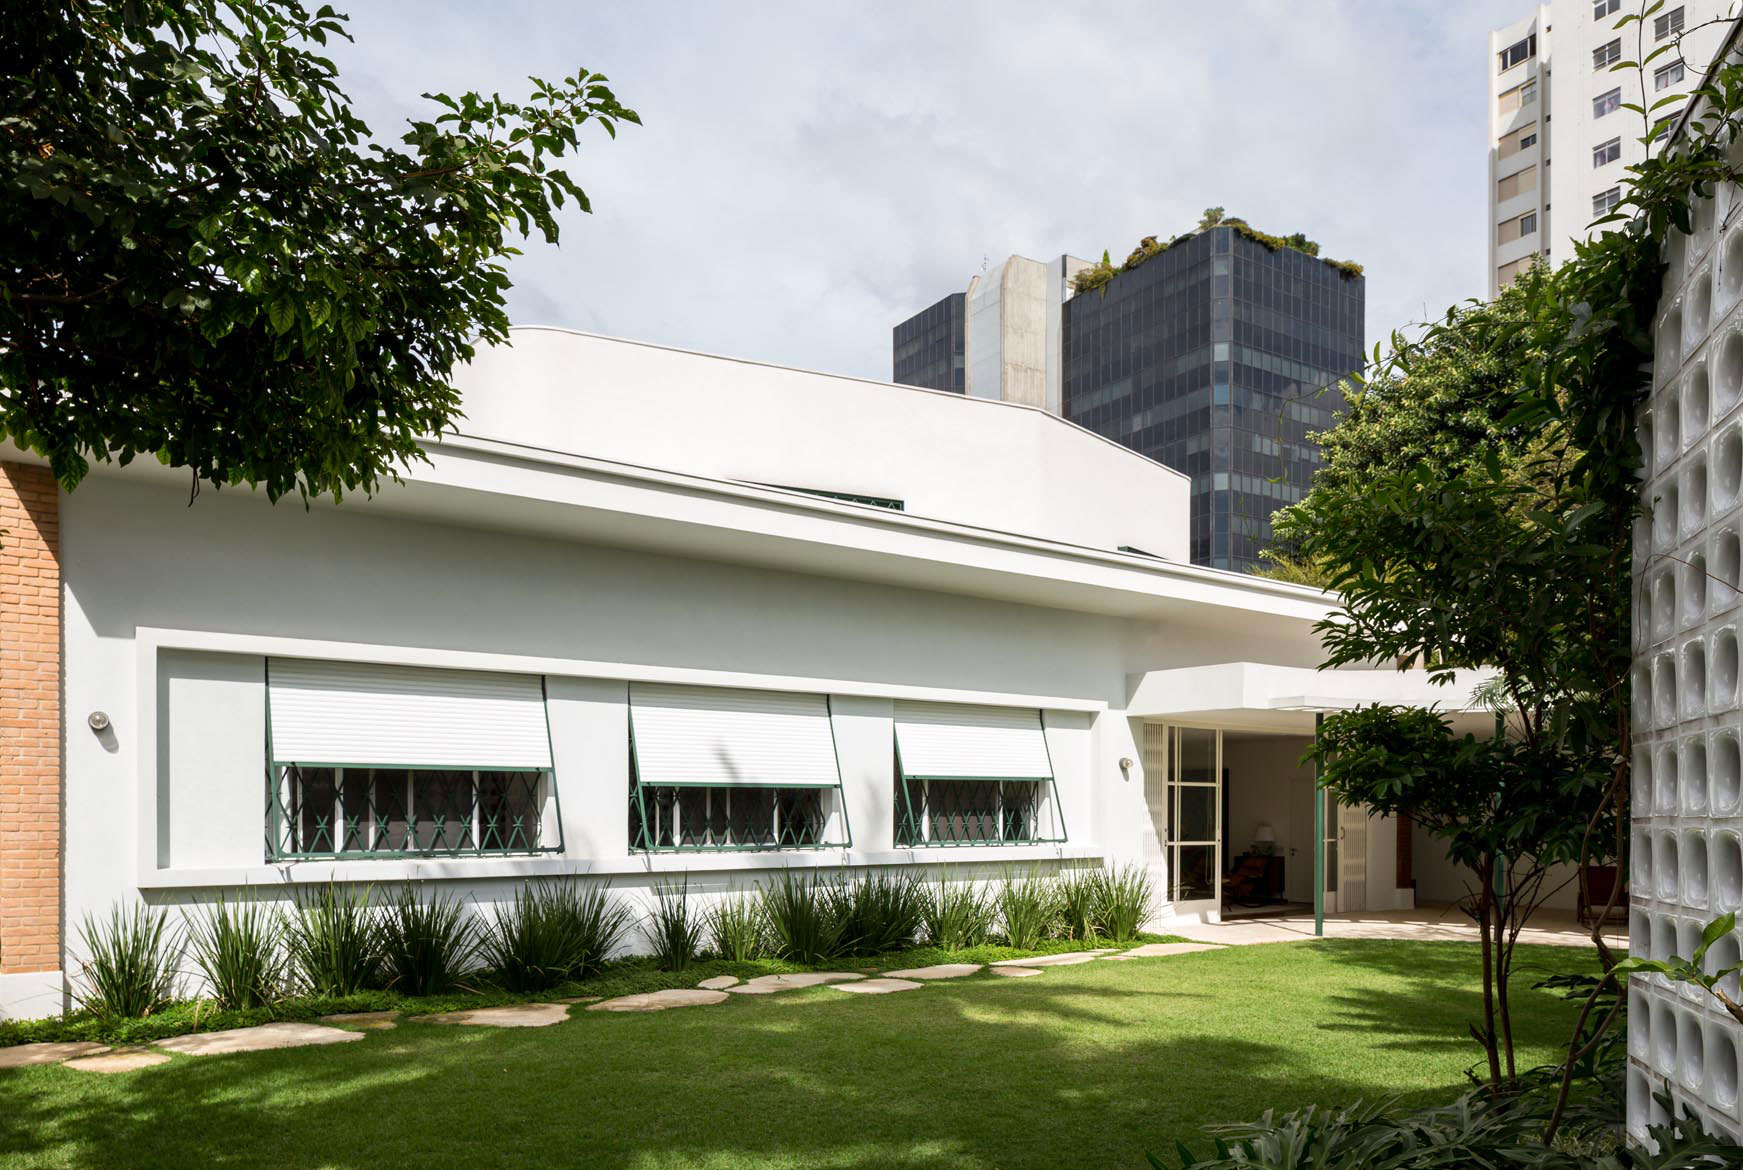 1940s modernist gem in Brazil gets gorgeous restoration and expansion